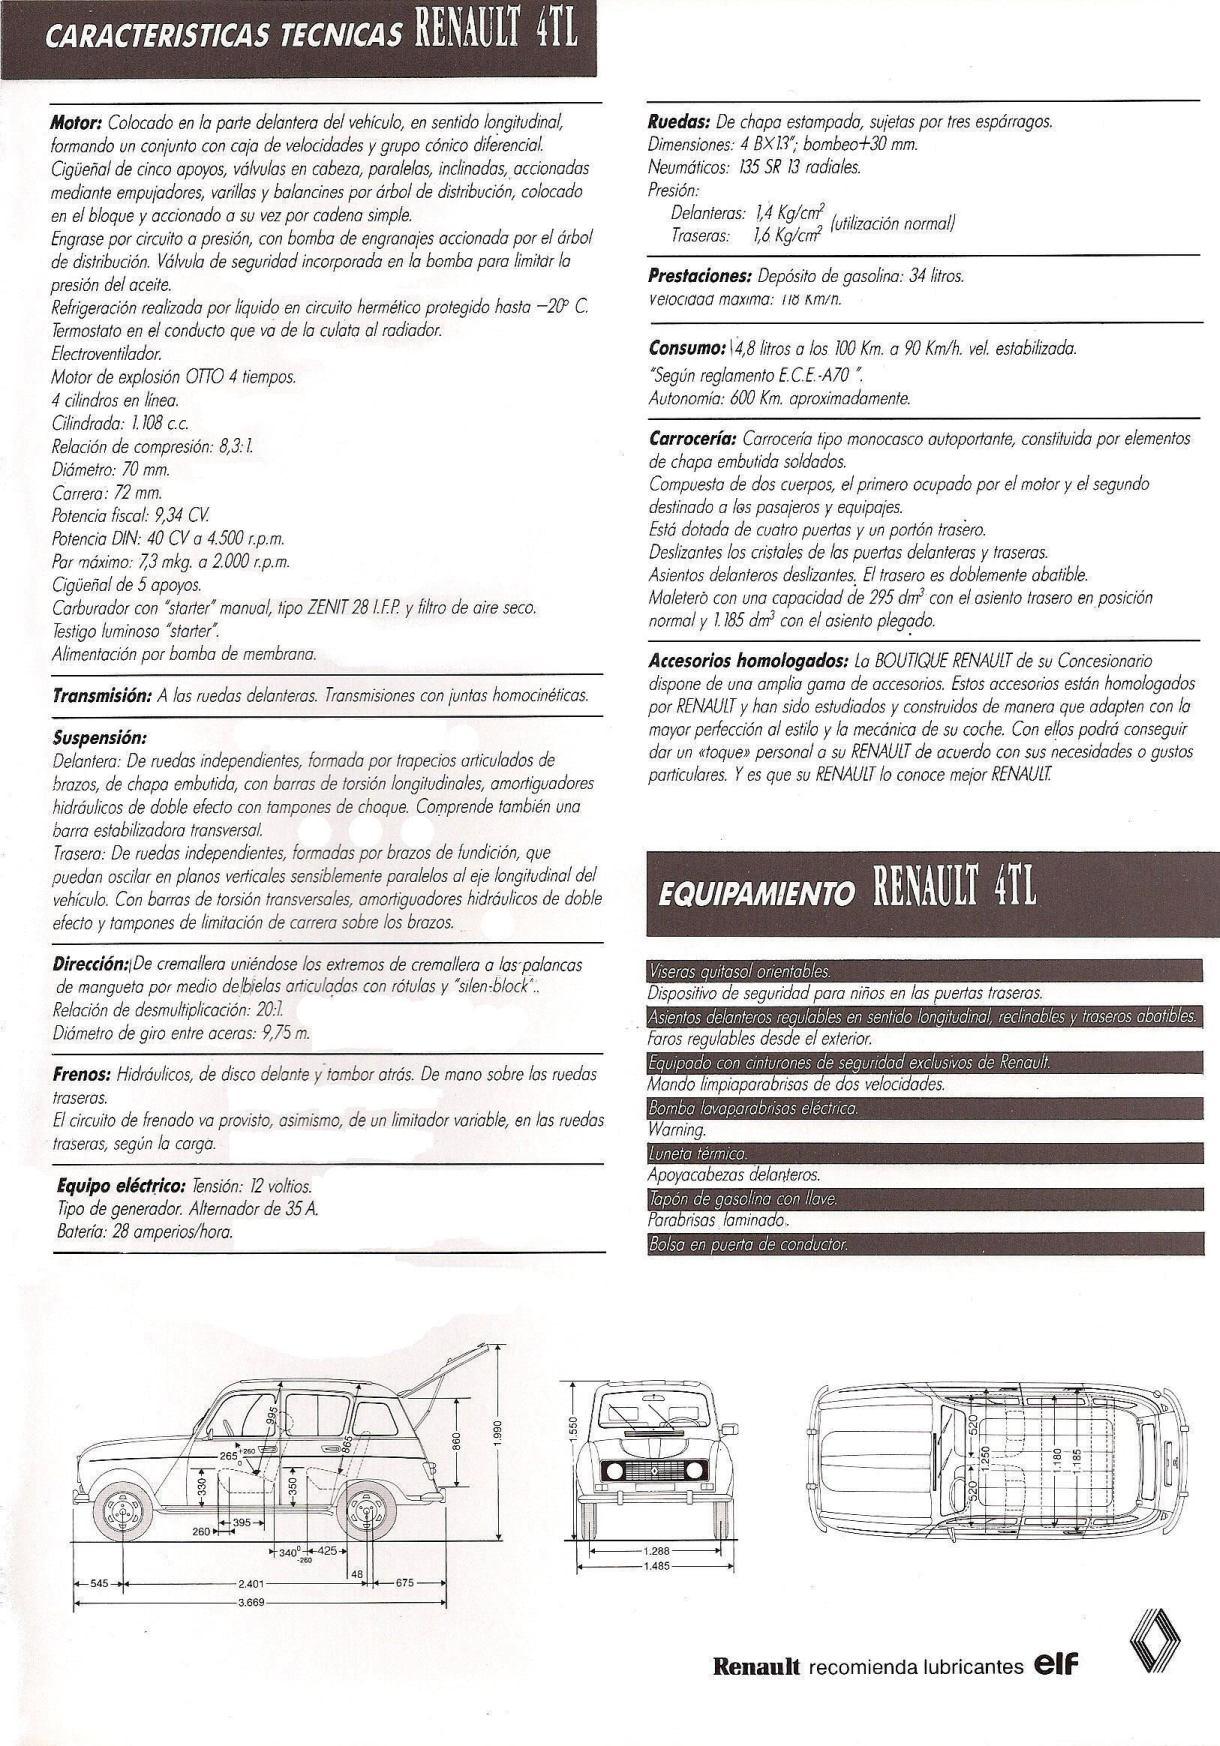 1988 Renault 4 TL brochure